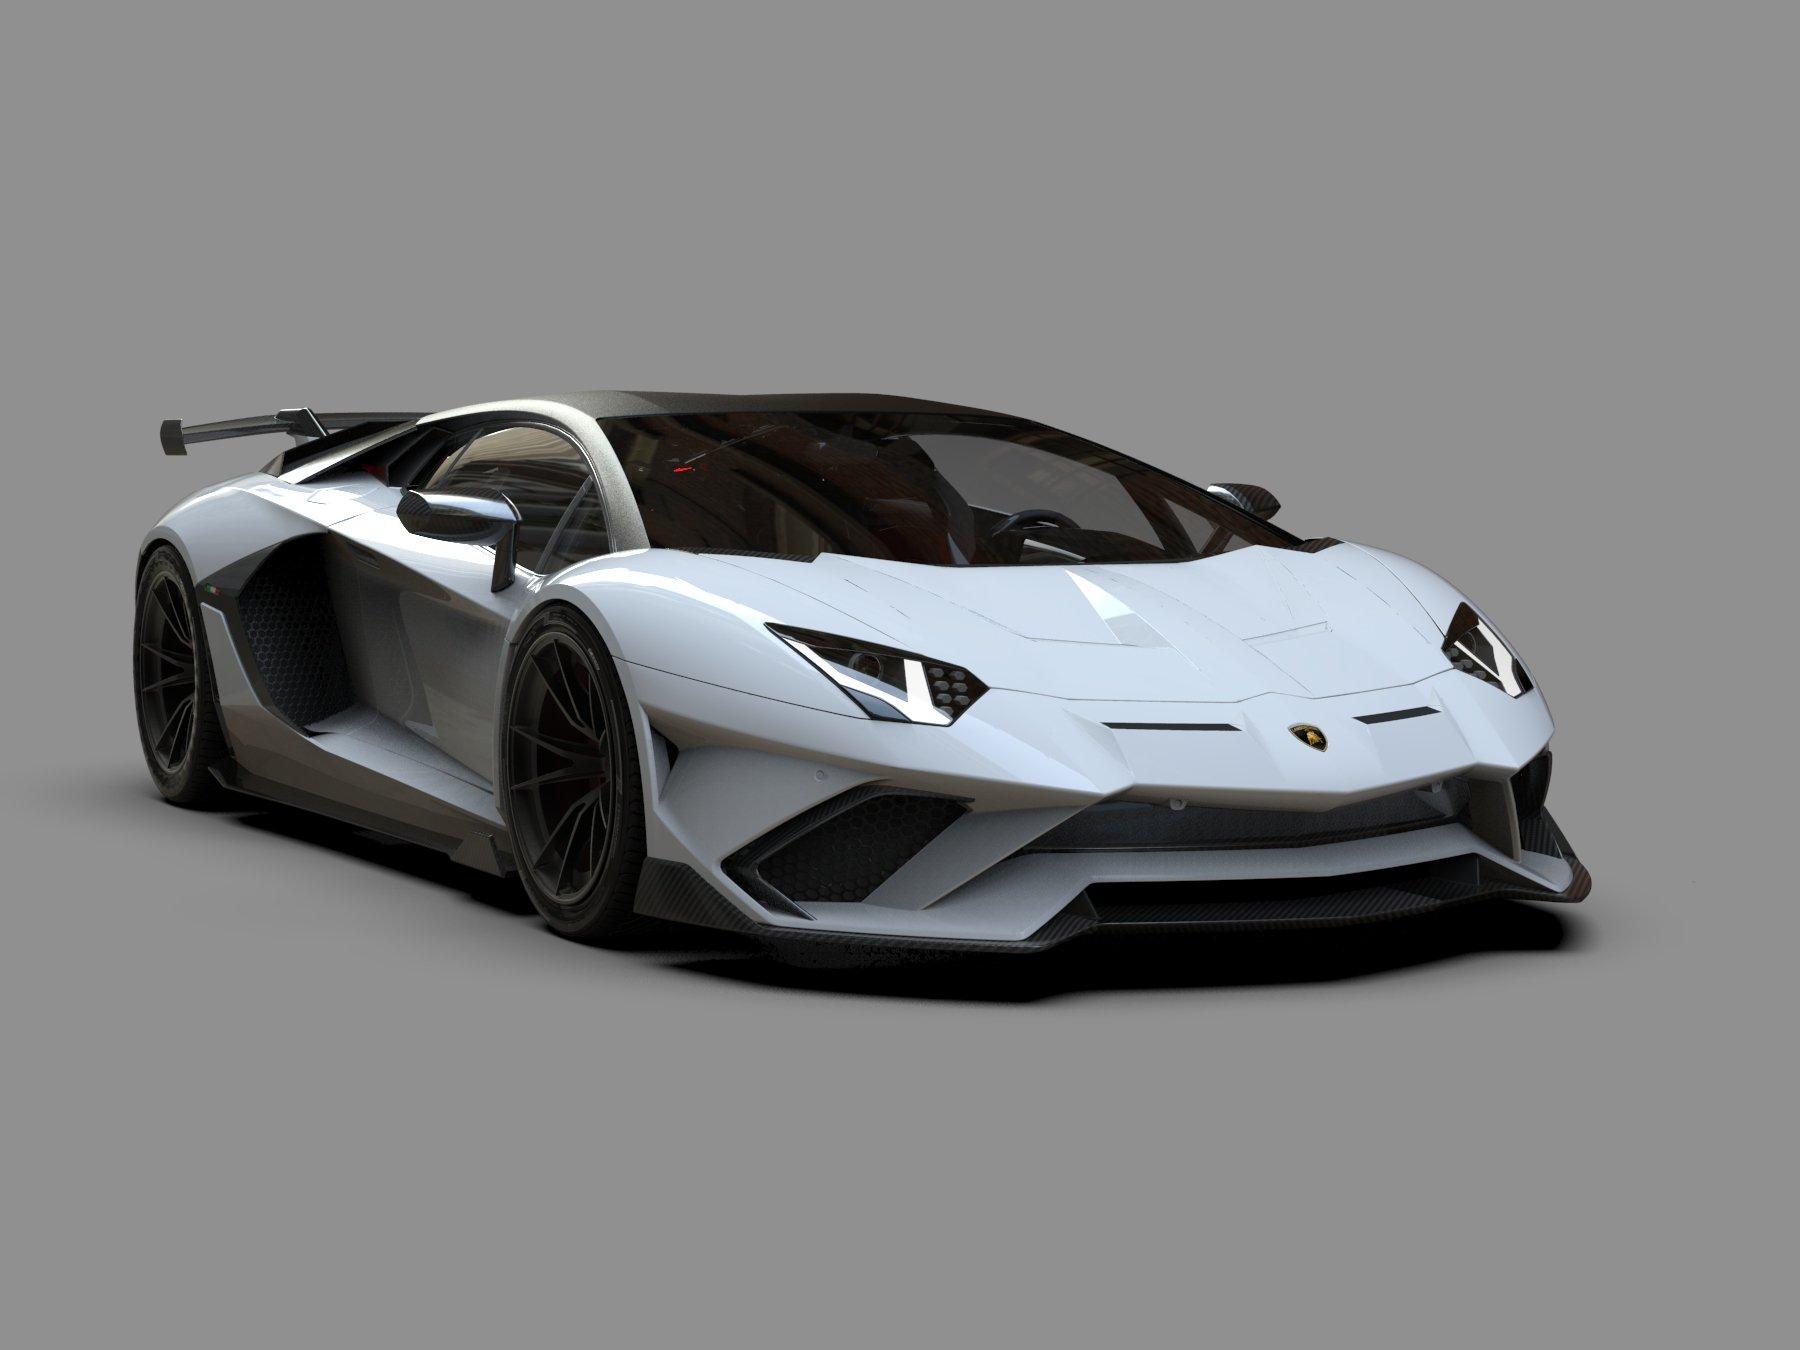 Lamborghini_Aventador_by_Duke_Dynamics_0023